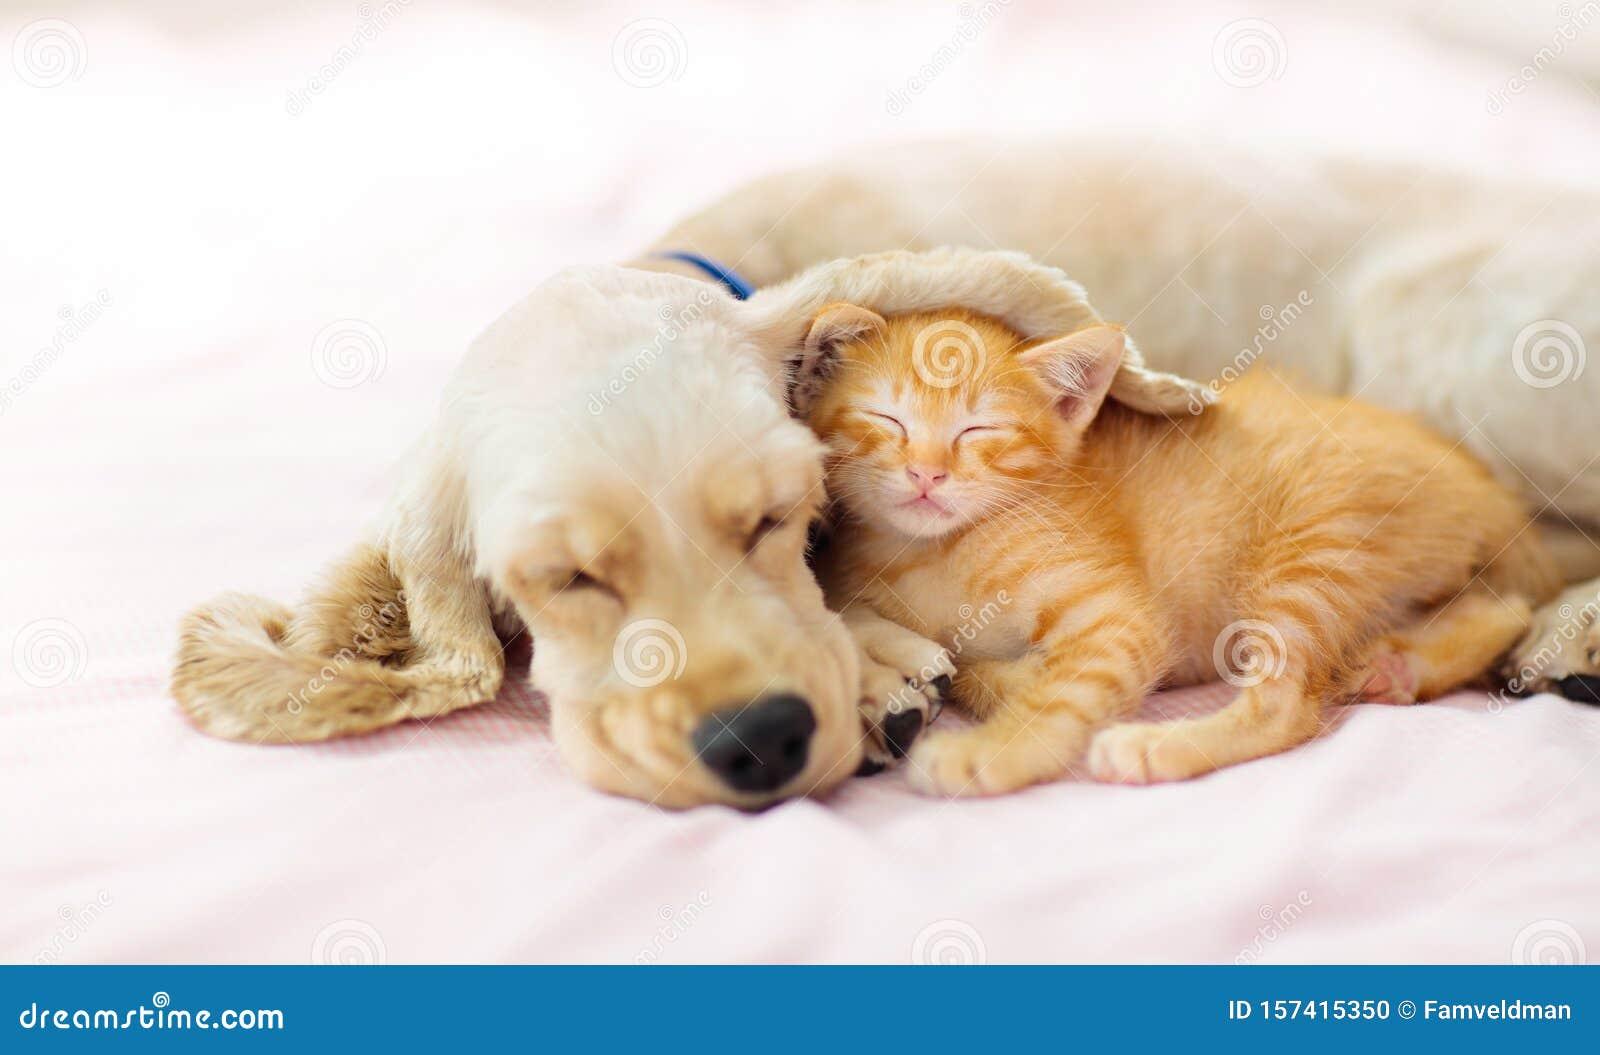 CLIPART SLEEPING KITTEN   Royalty free vector design   Sleeping kitten,  Kitten cartoon, Cat clipart